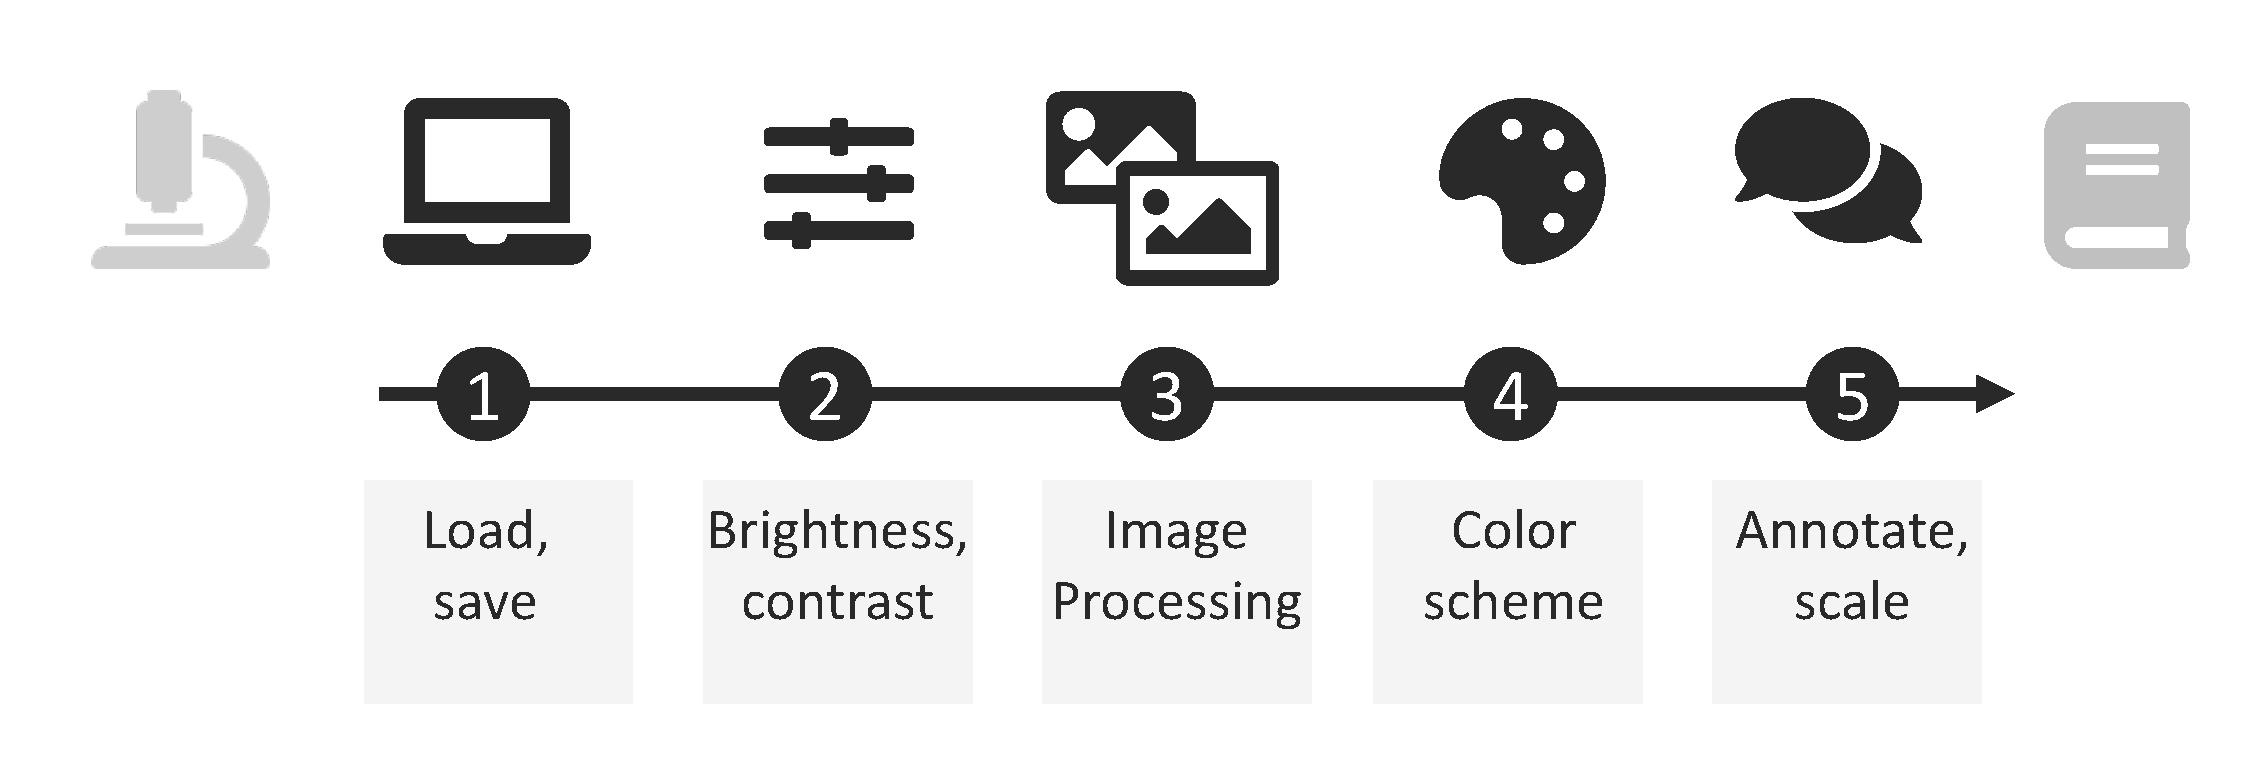 Pictogram examples